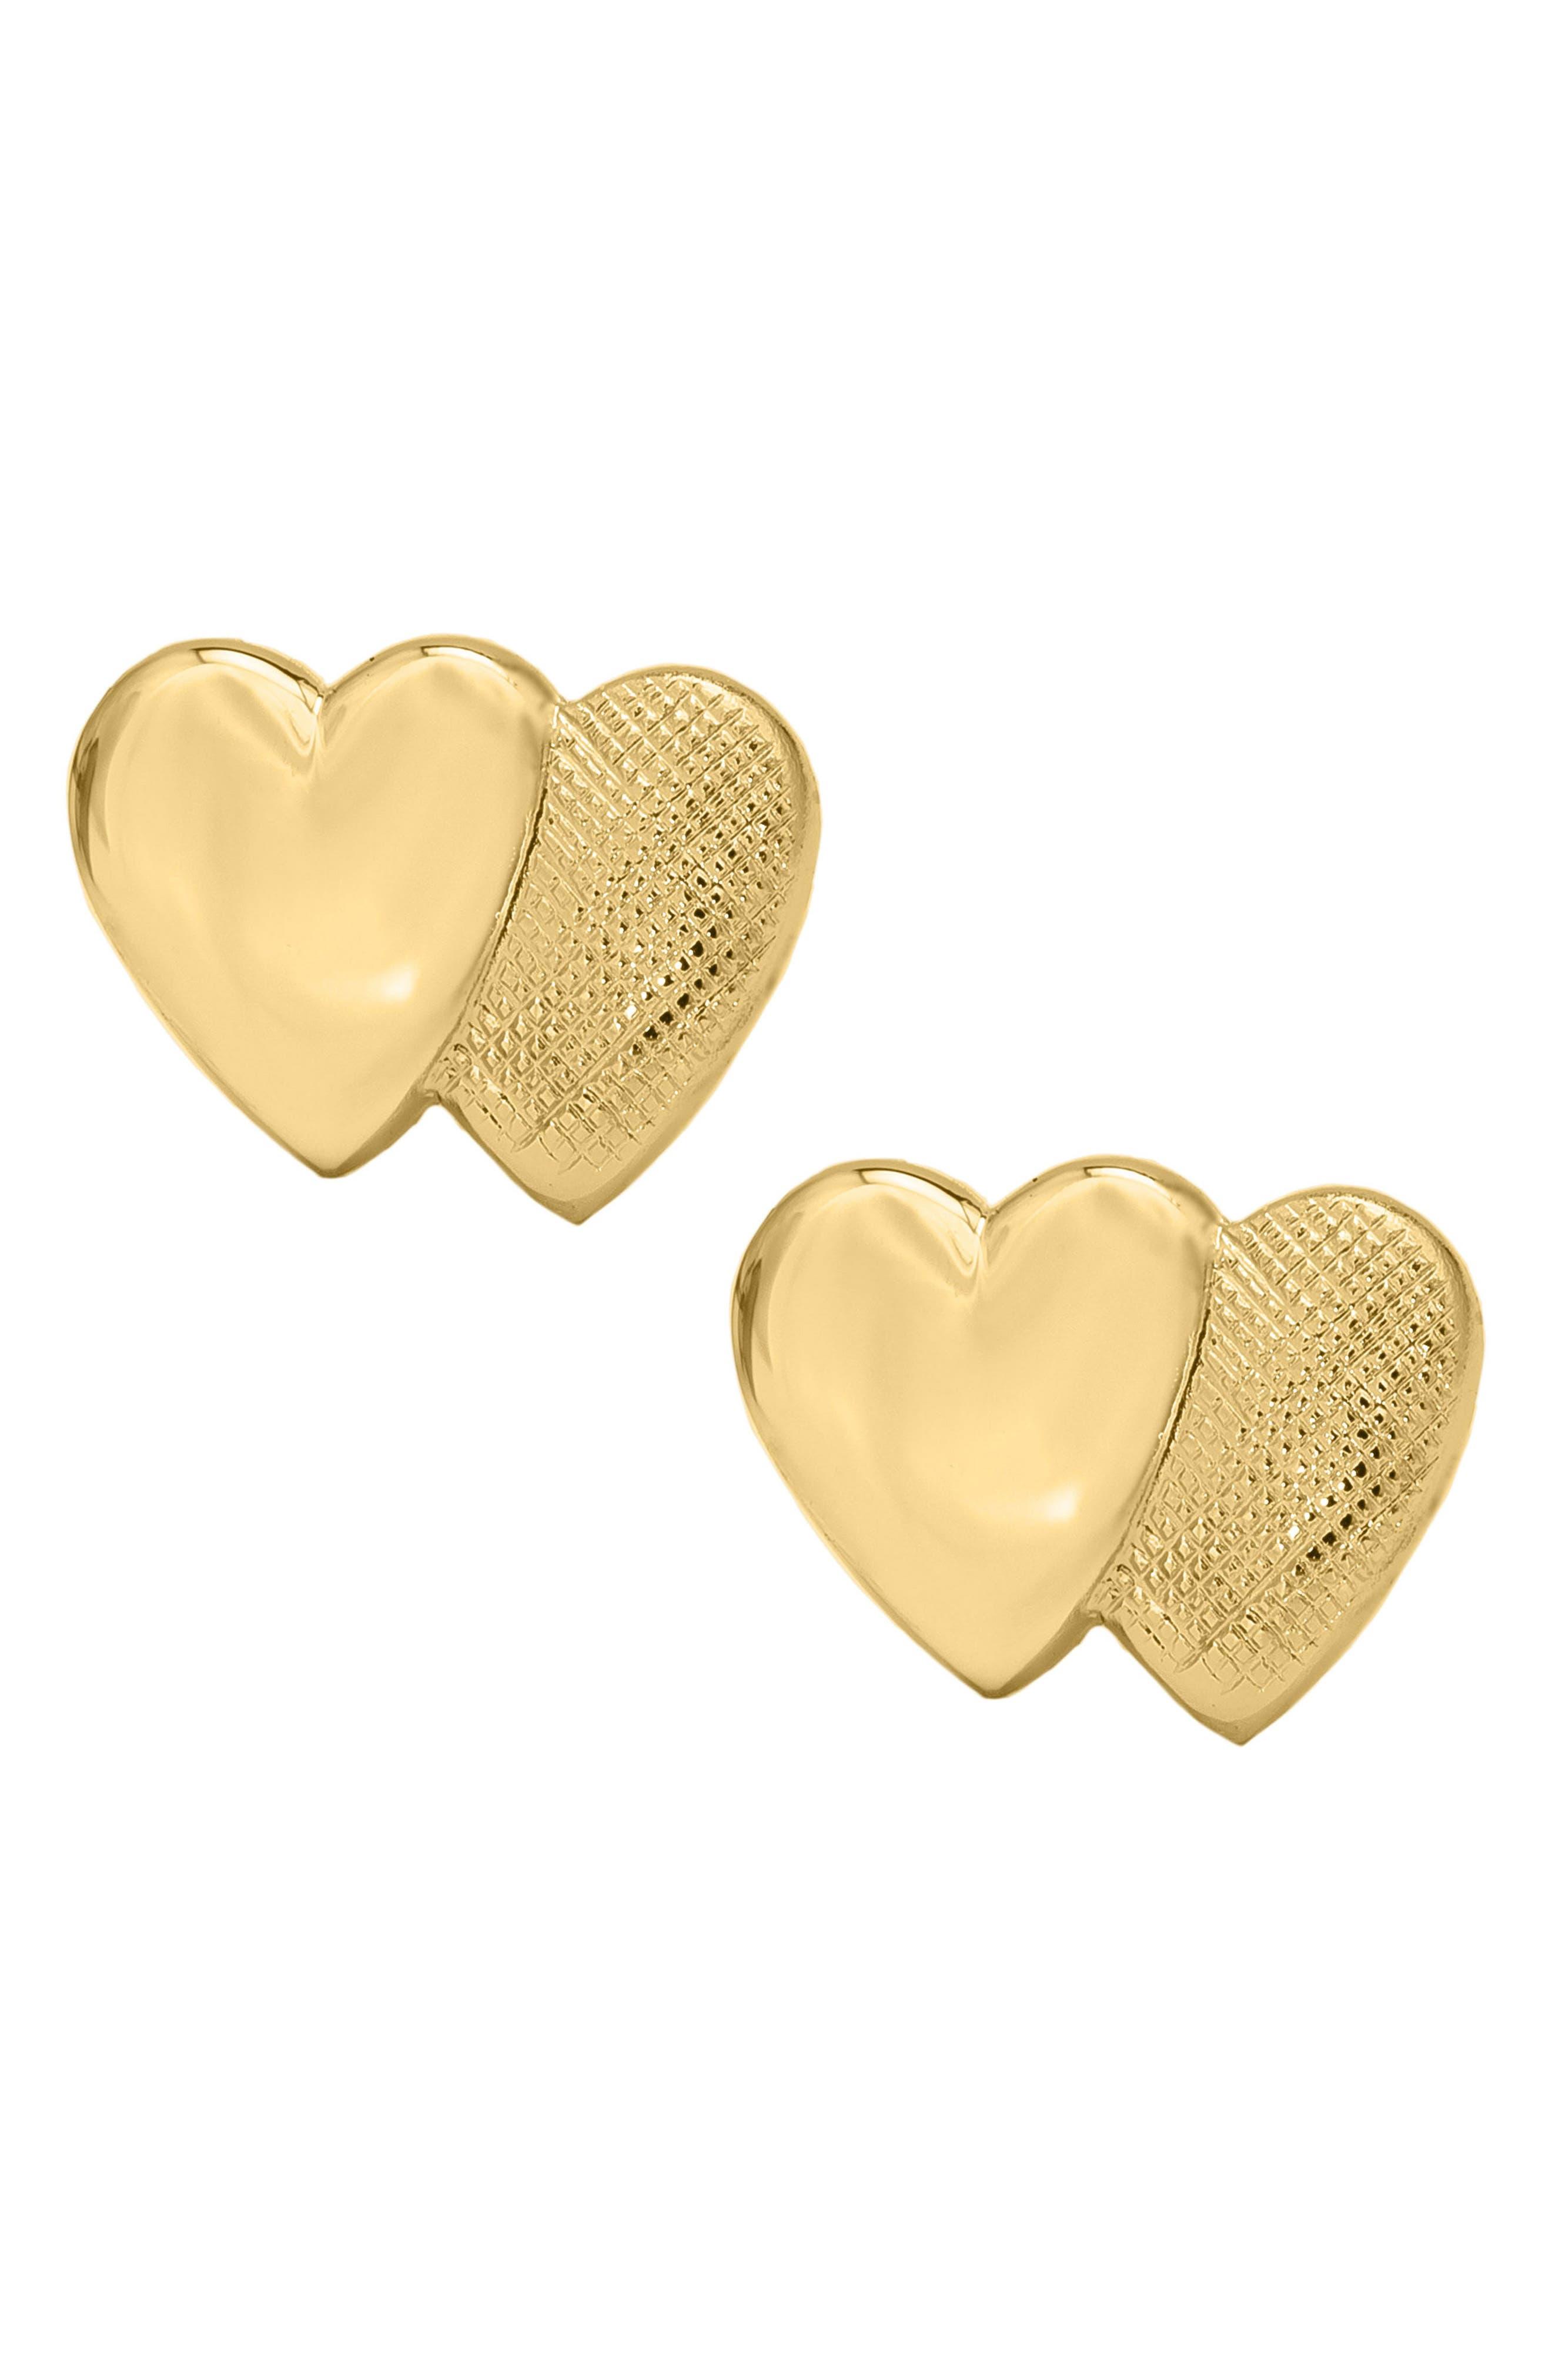 14k Gold Double Heart Earrings,                             Main thumbnail 1, color,                             Gold